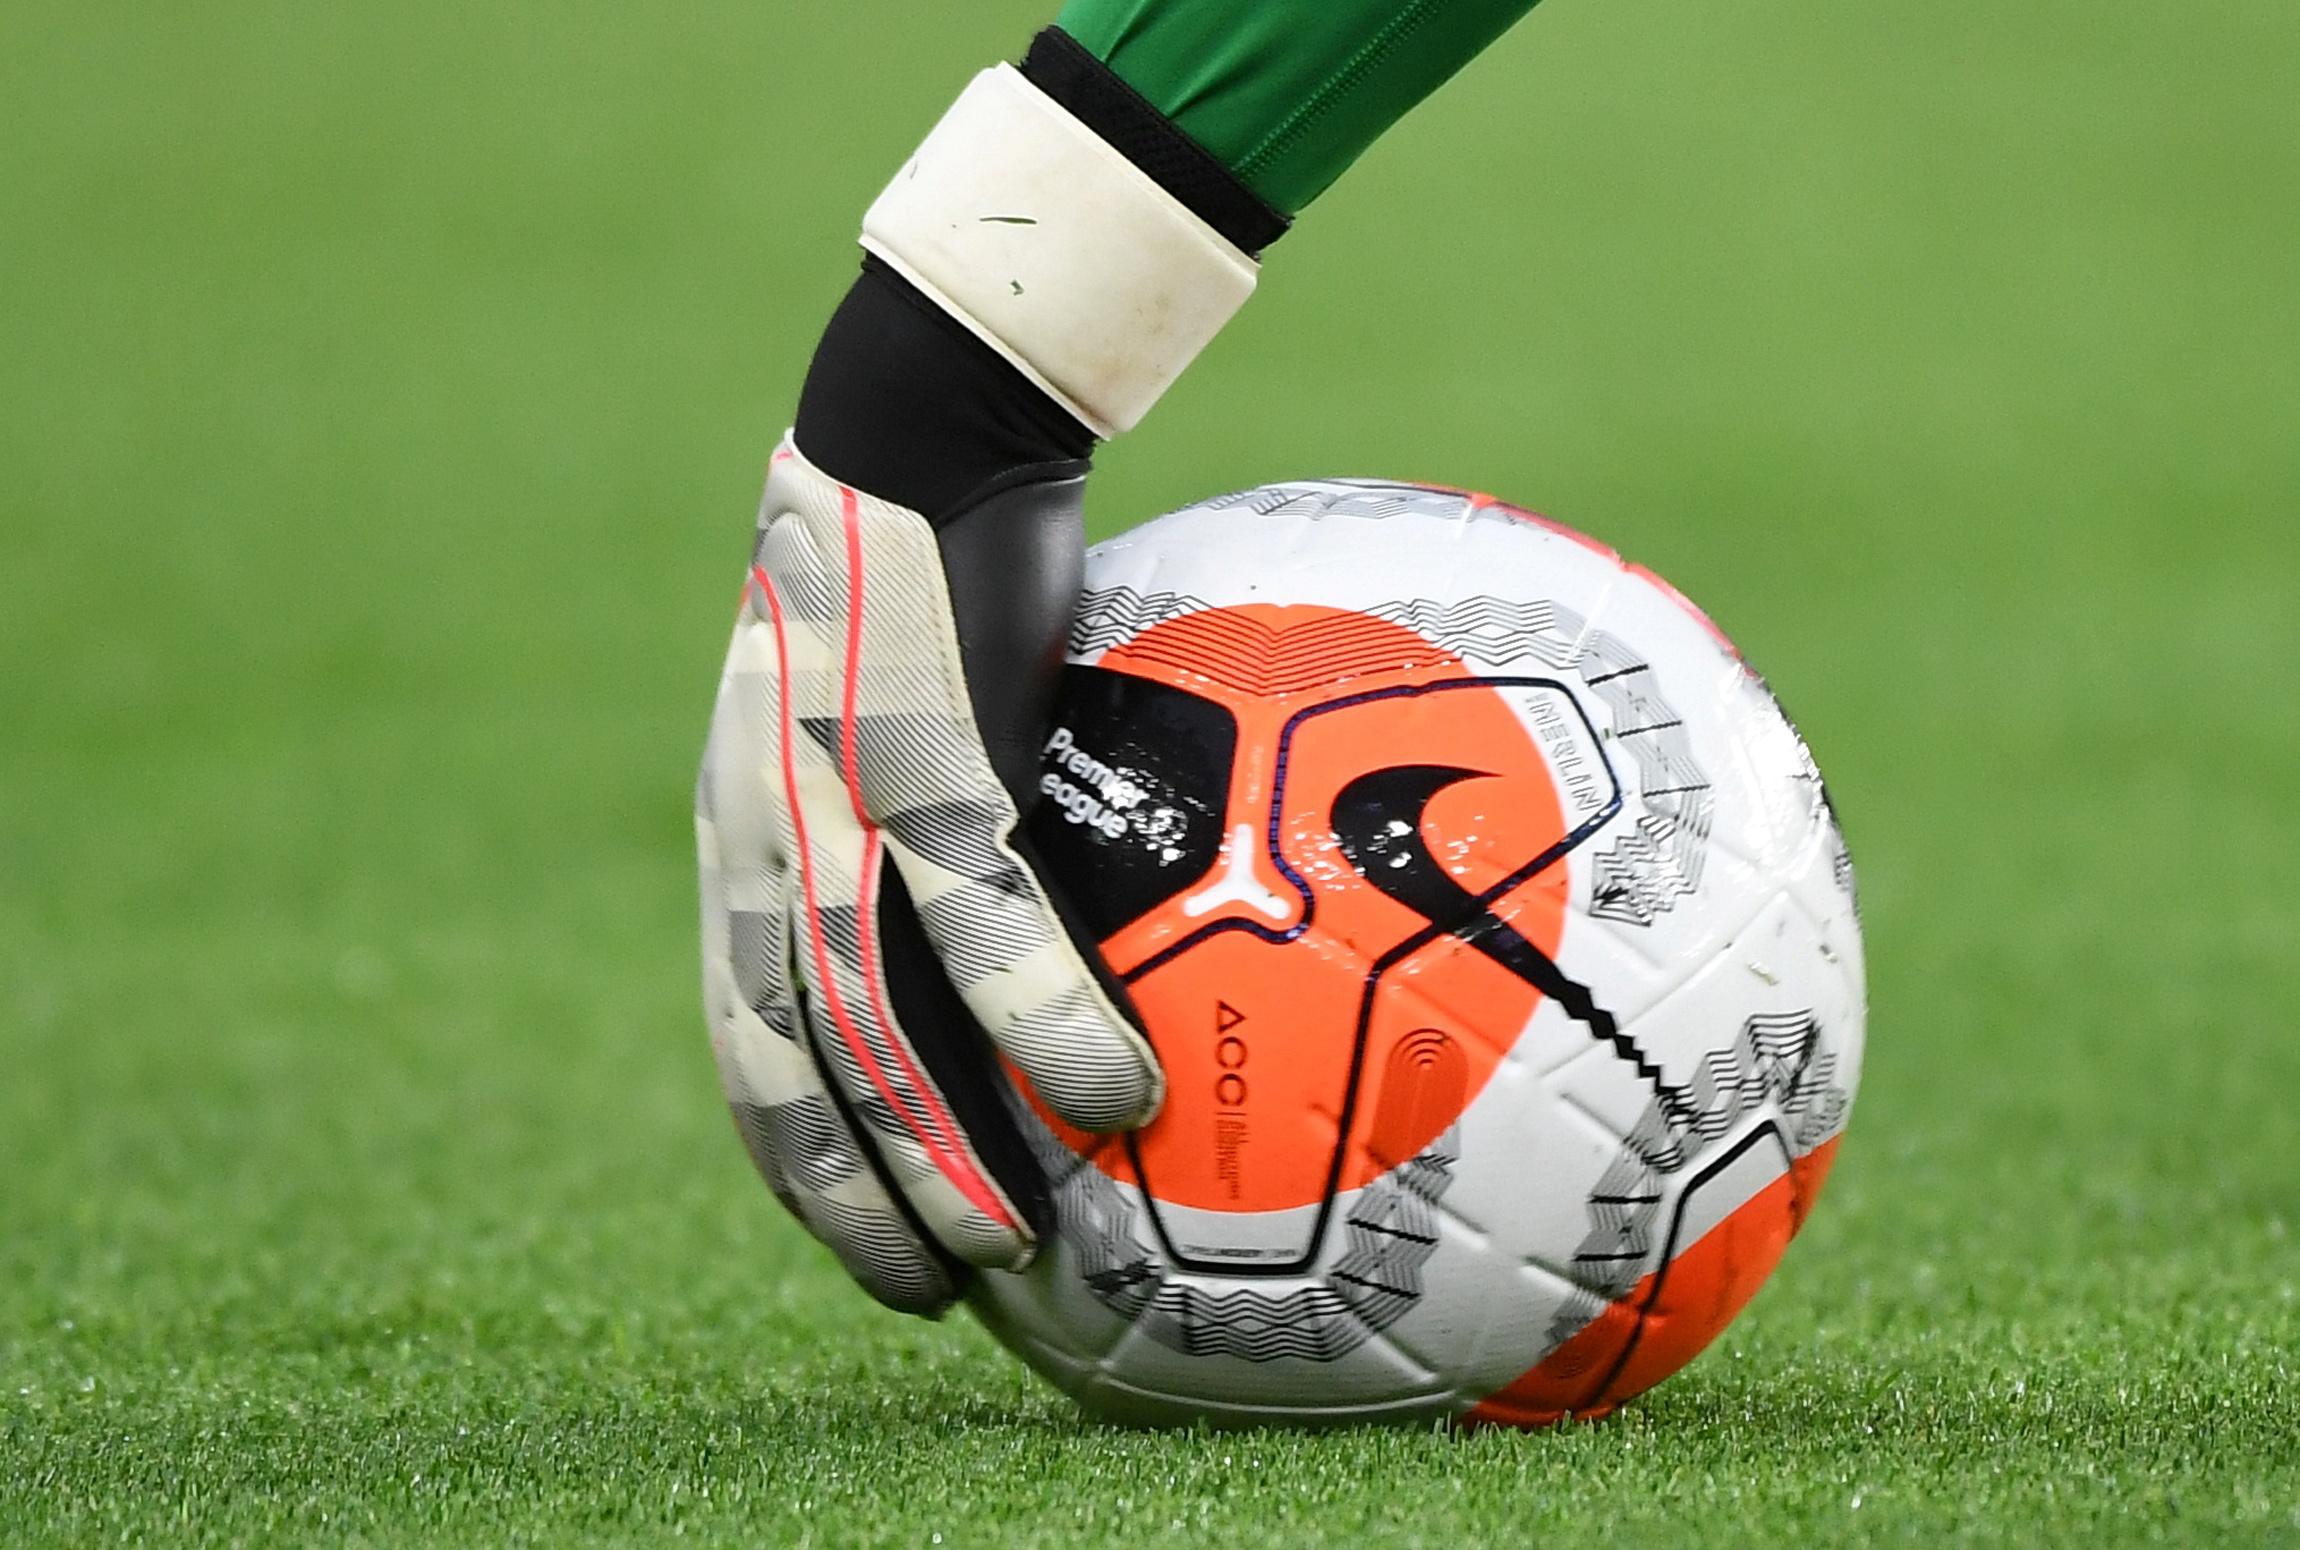 Premier League: Απώλειες πάνω από 2 δισ. ευρώ στην Αγγλία